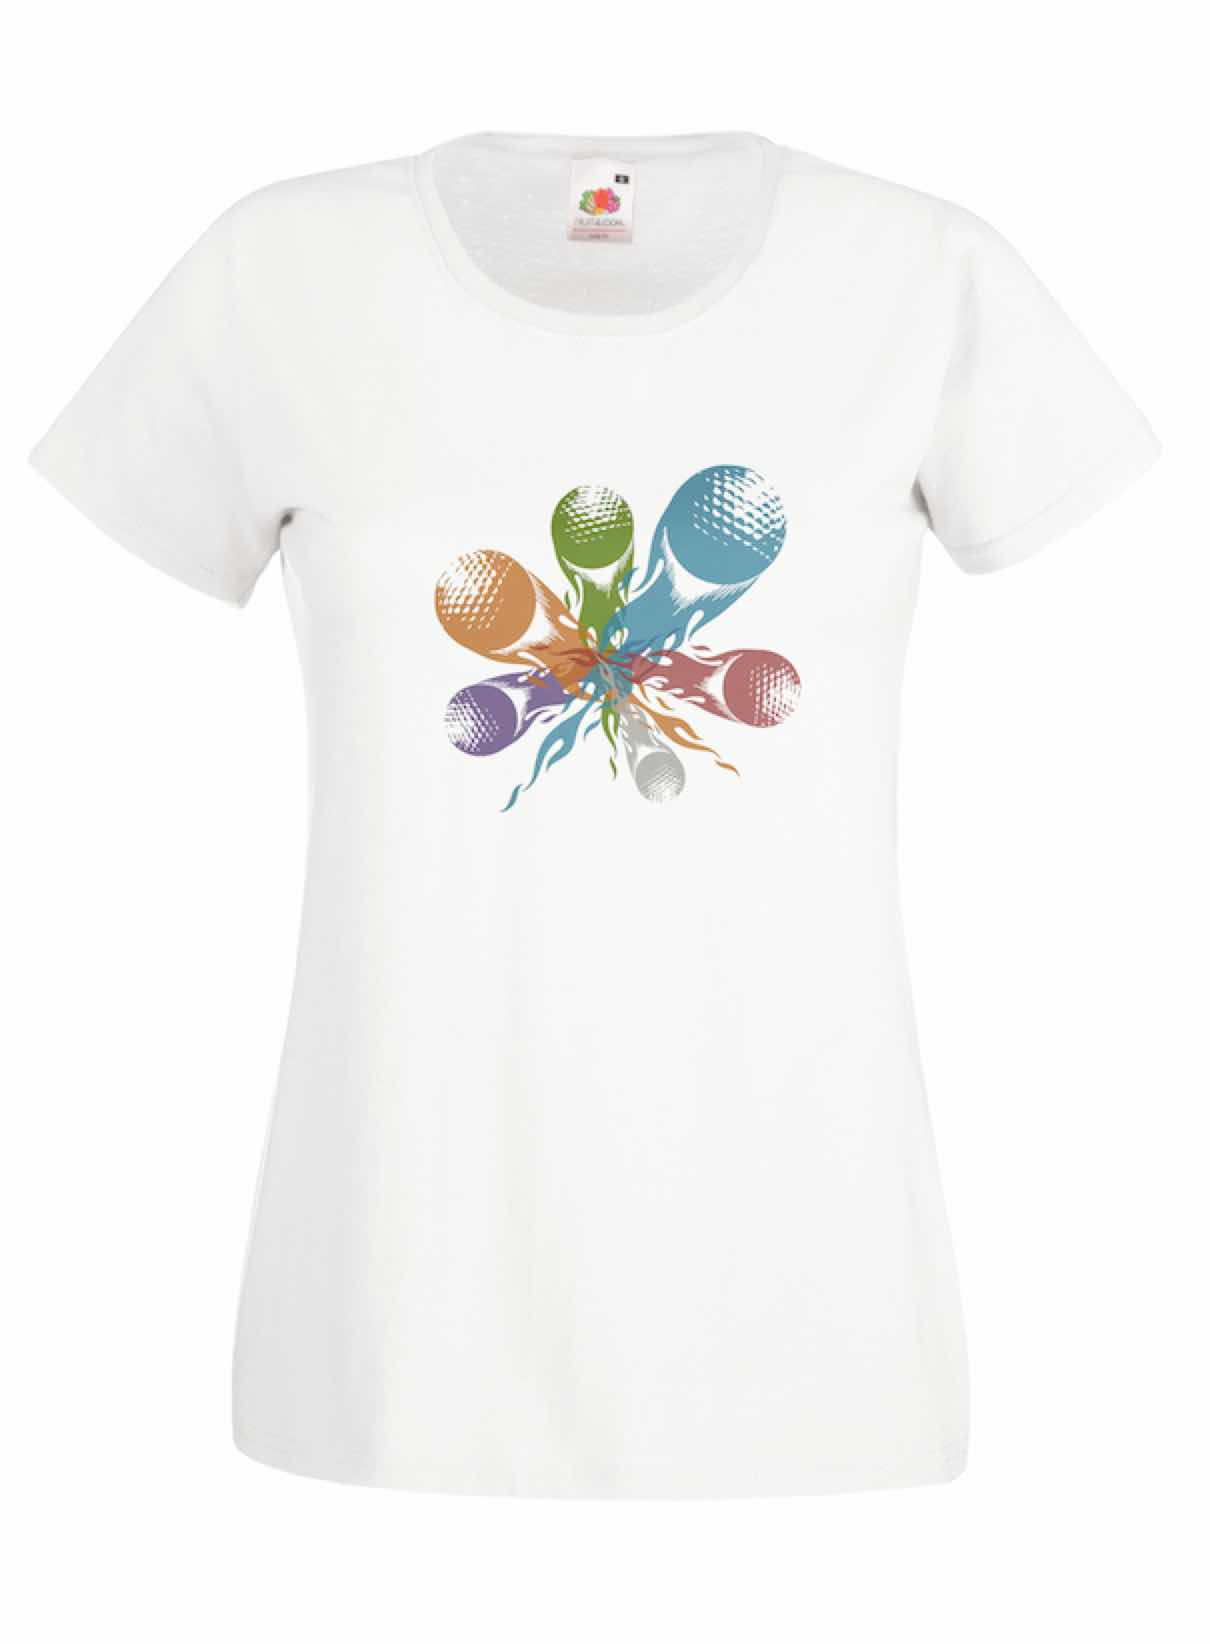 Burst design for t-shirt, hoodie & sweatshirt